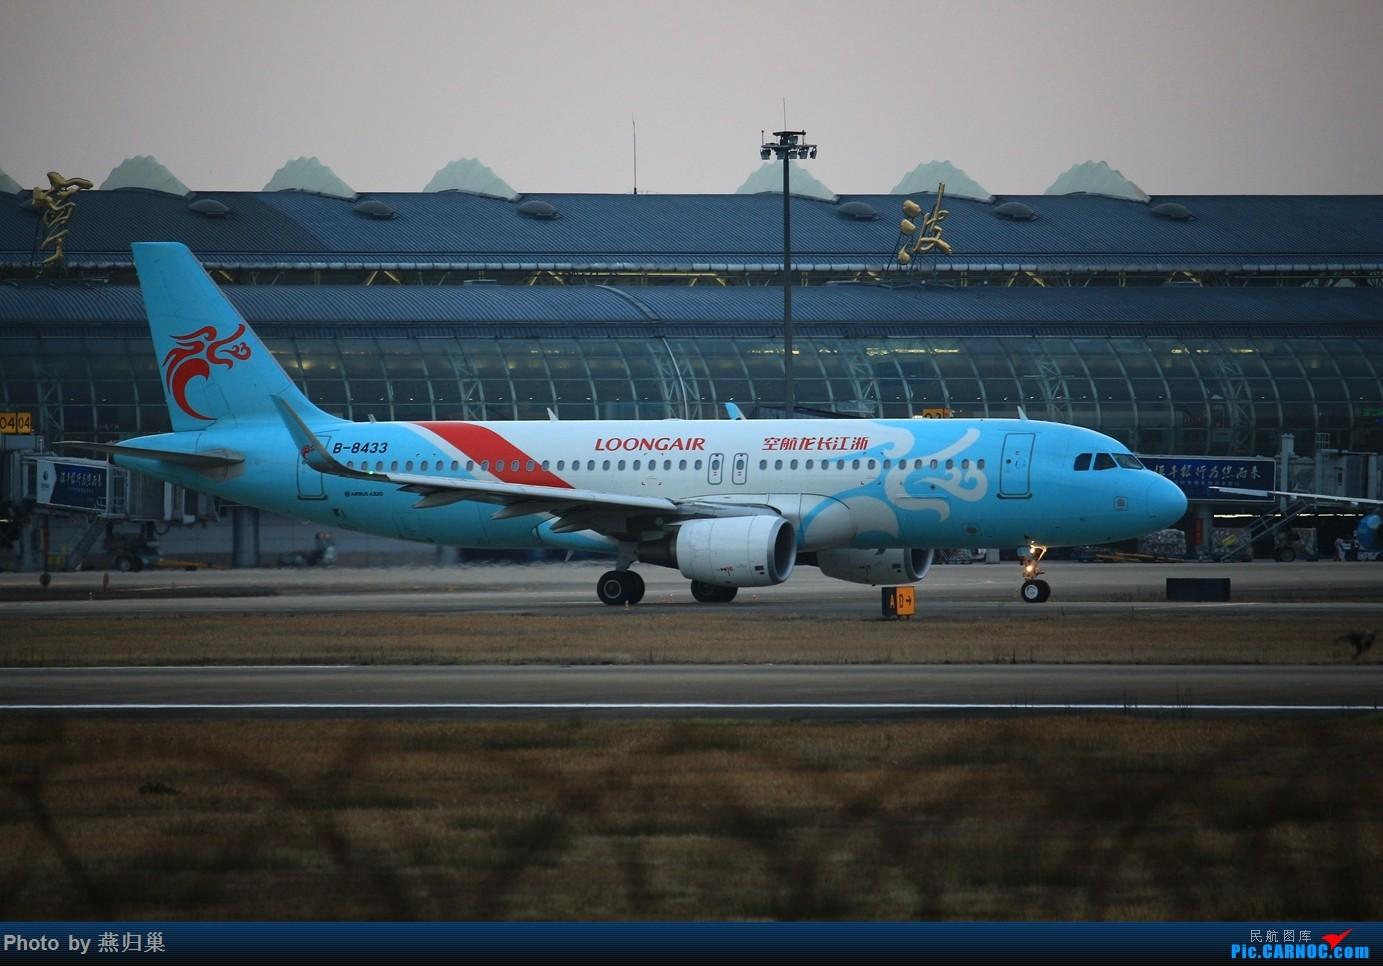 Re:[原创]【宁波飞友会】年前NGB拍机合集 AIRBUS A320-200 B-8433 中国宁波栎社国际机场